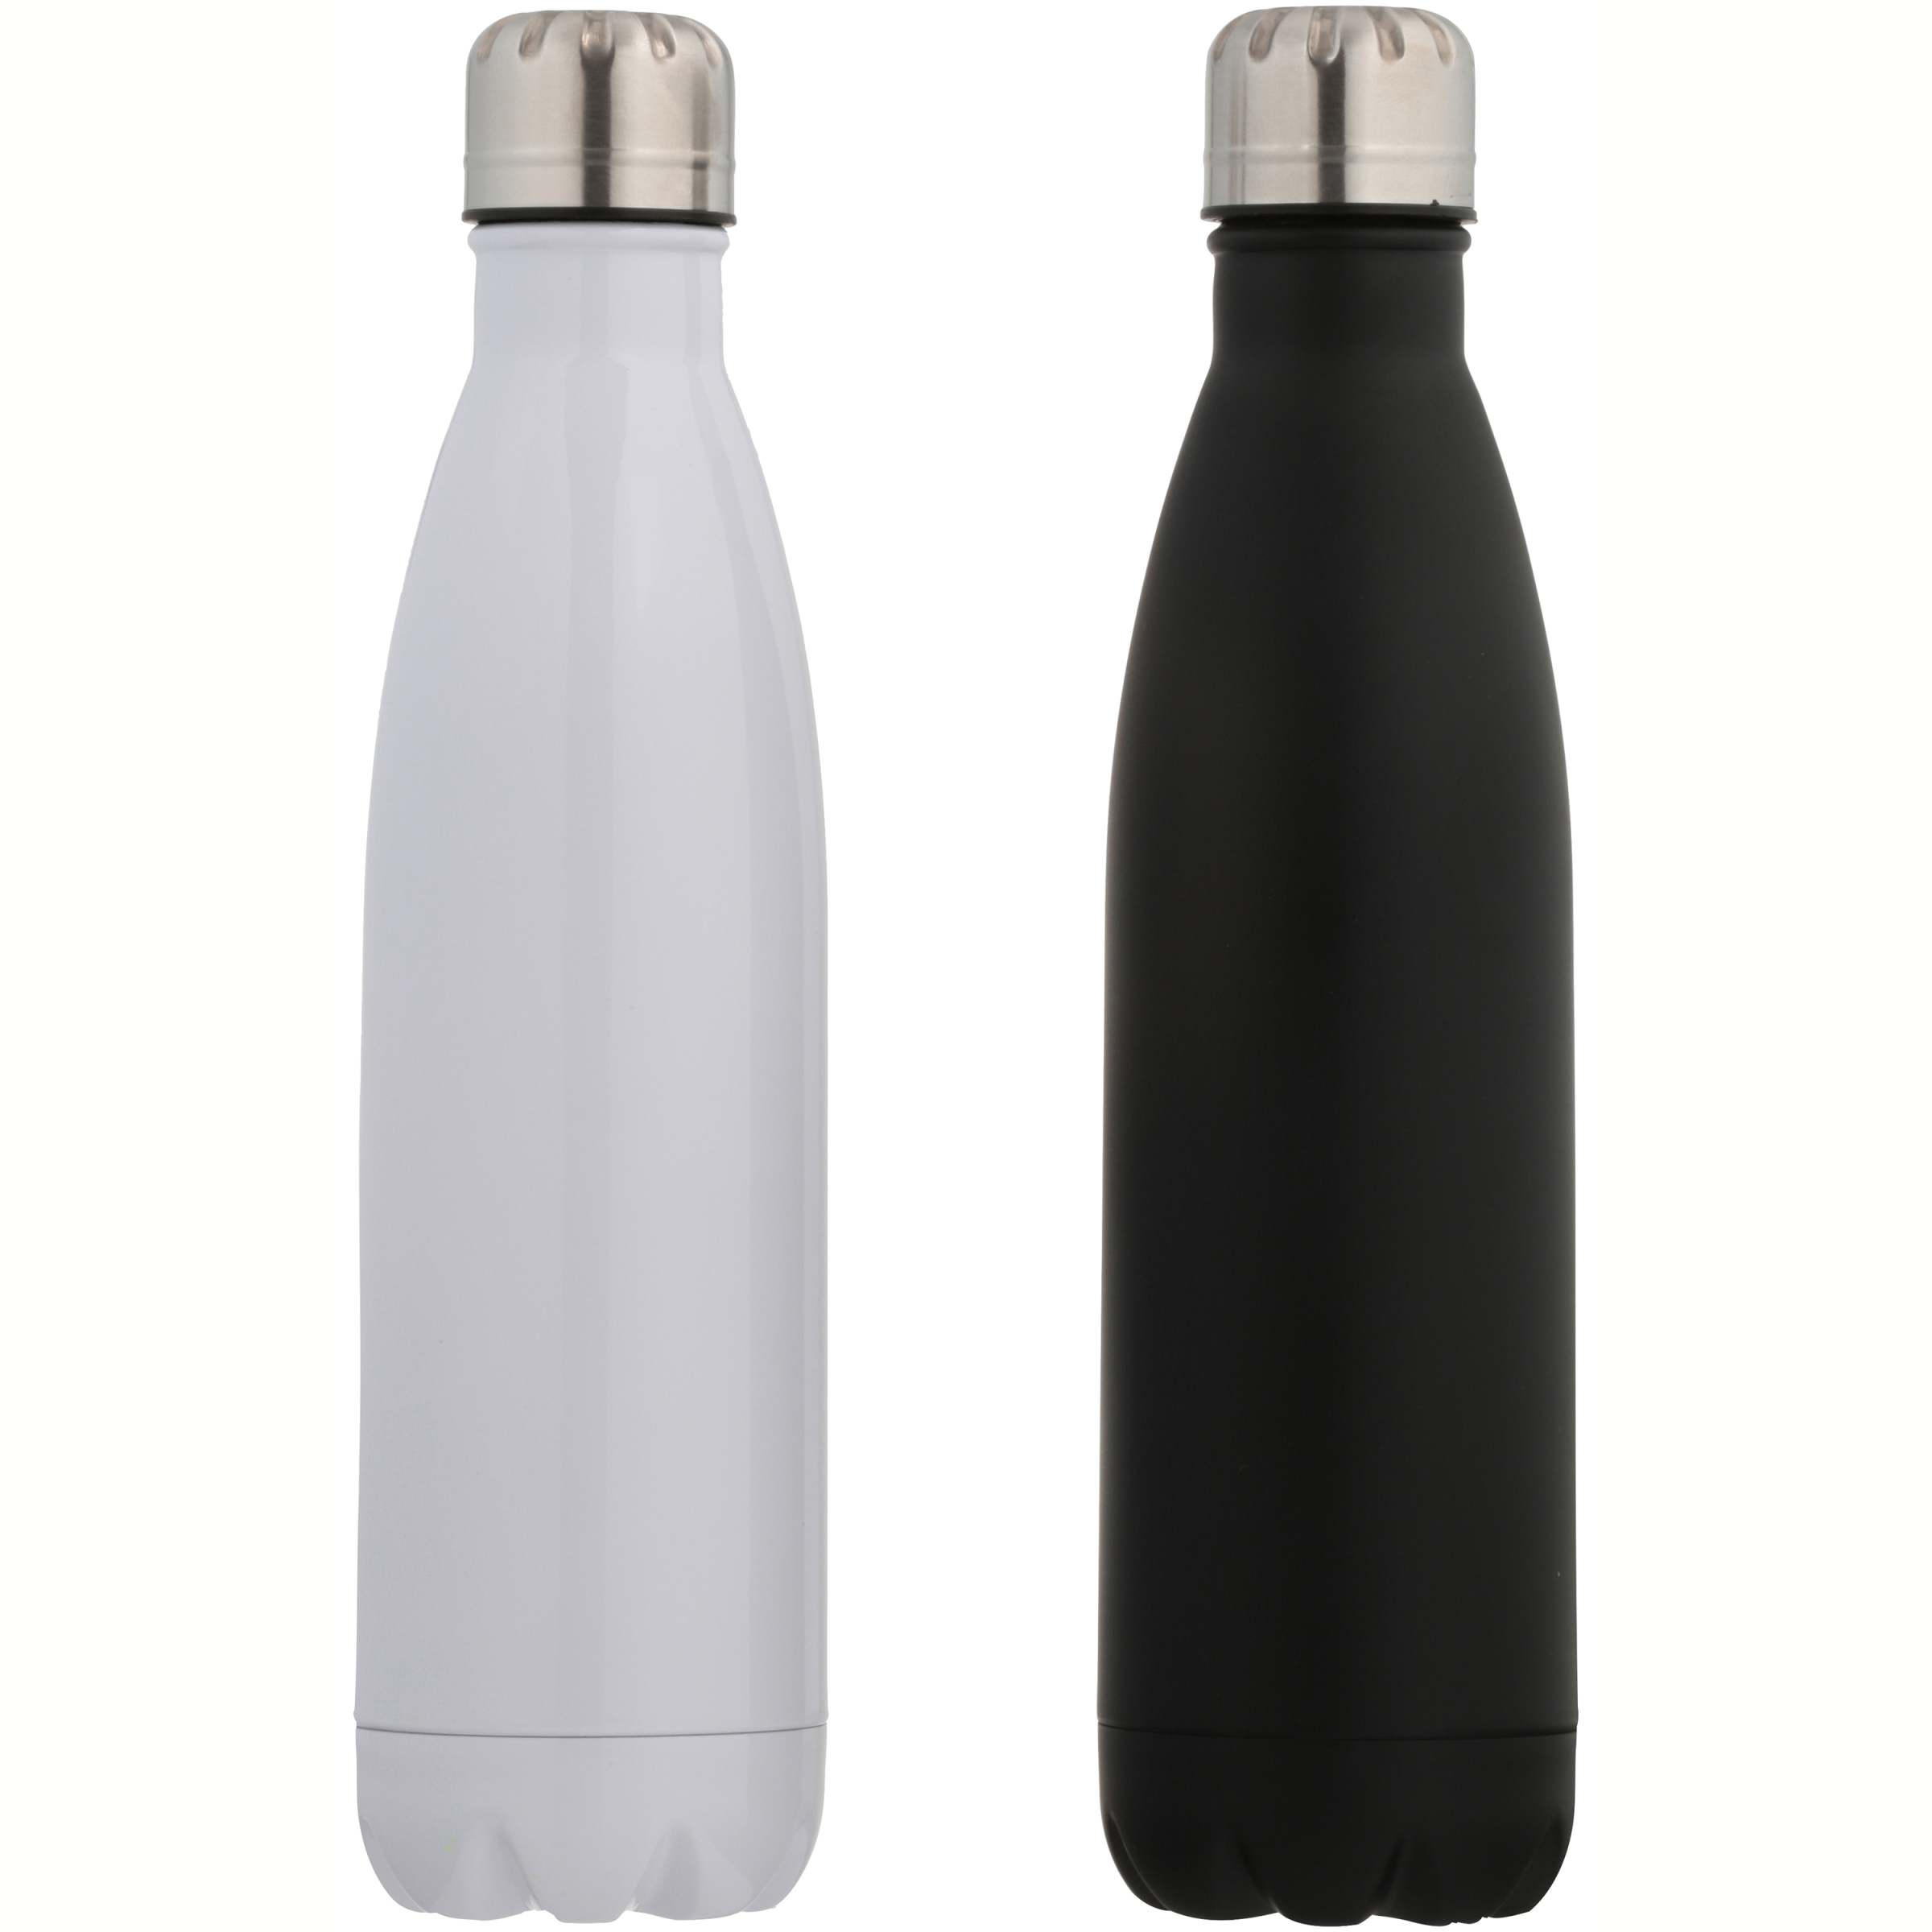 Mainstays™ Double Wall Vacuum Black/White 17 oz. Sports Bottle 2 ct Box